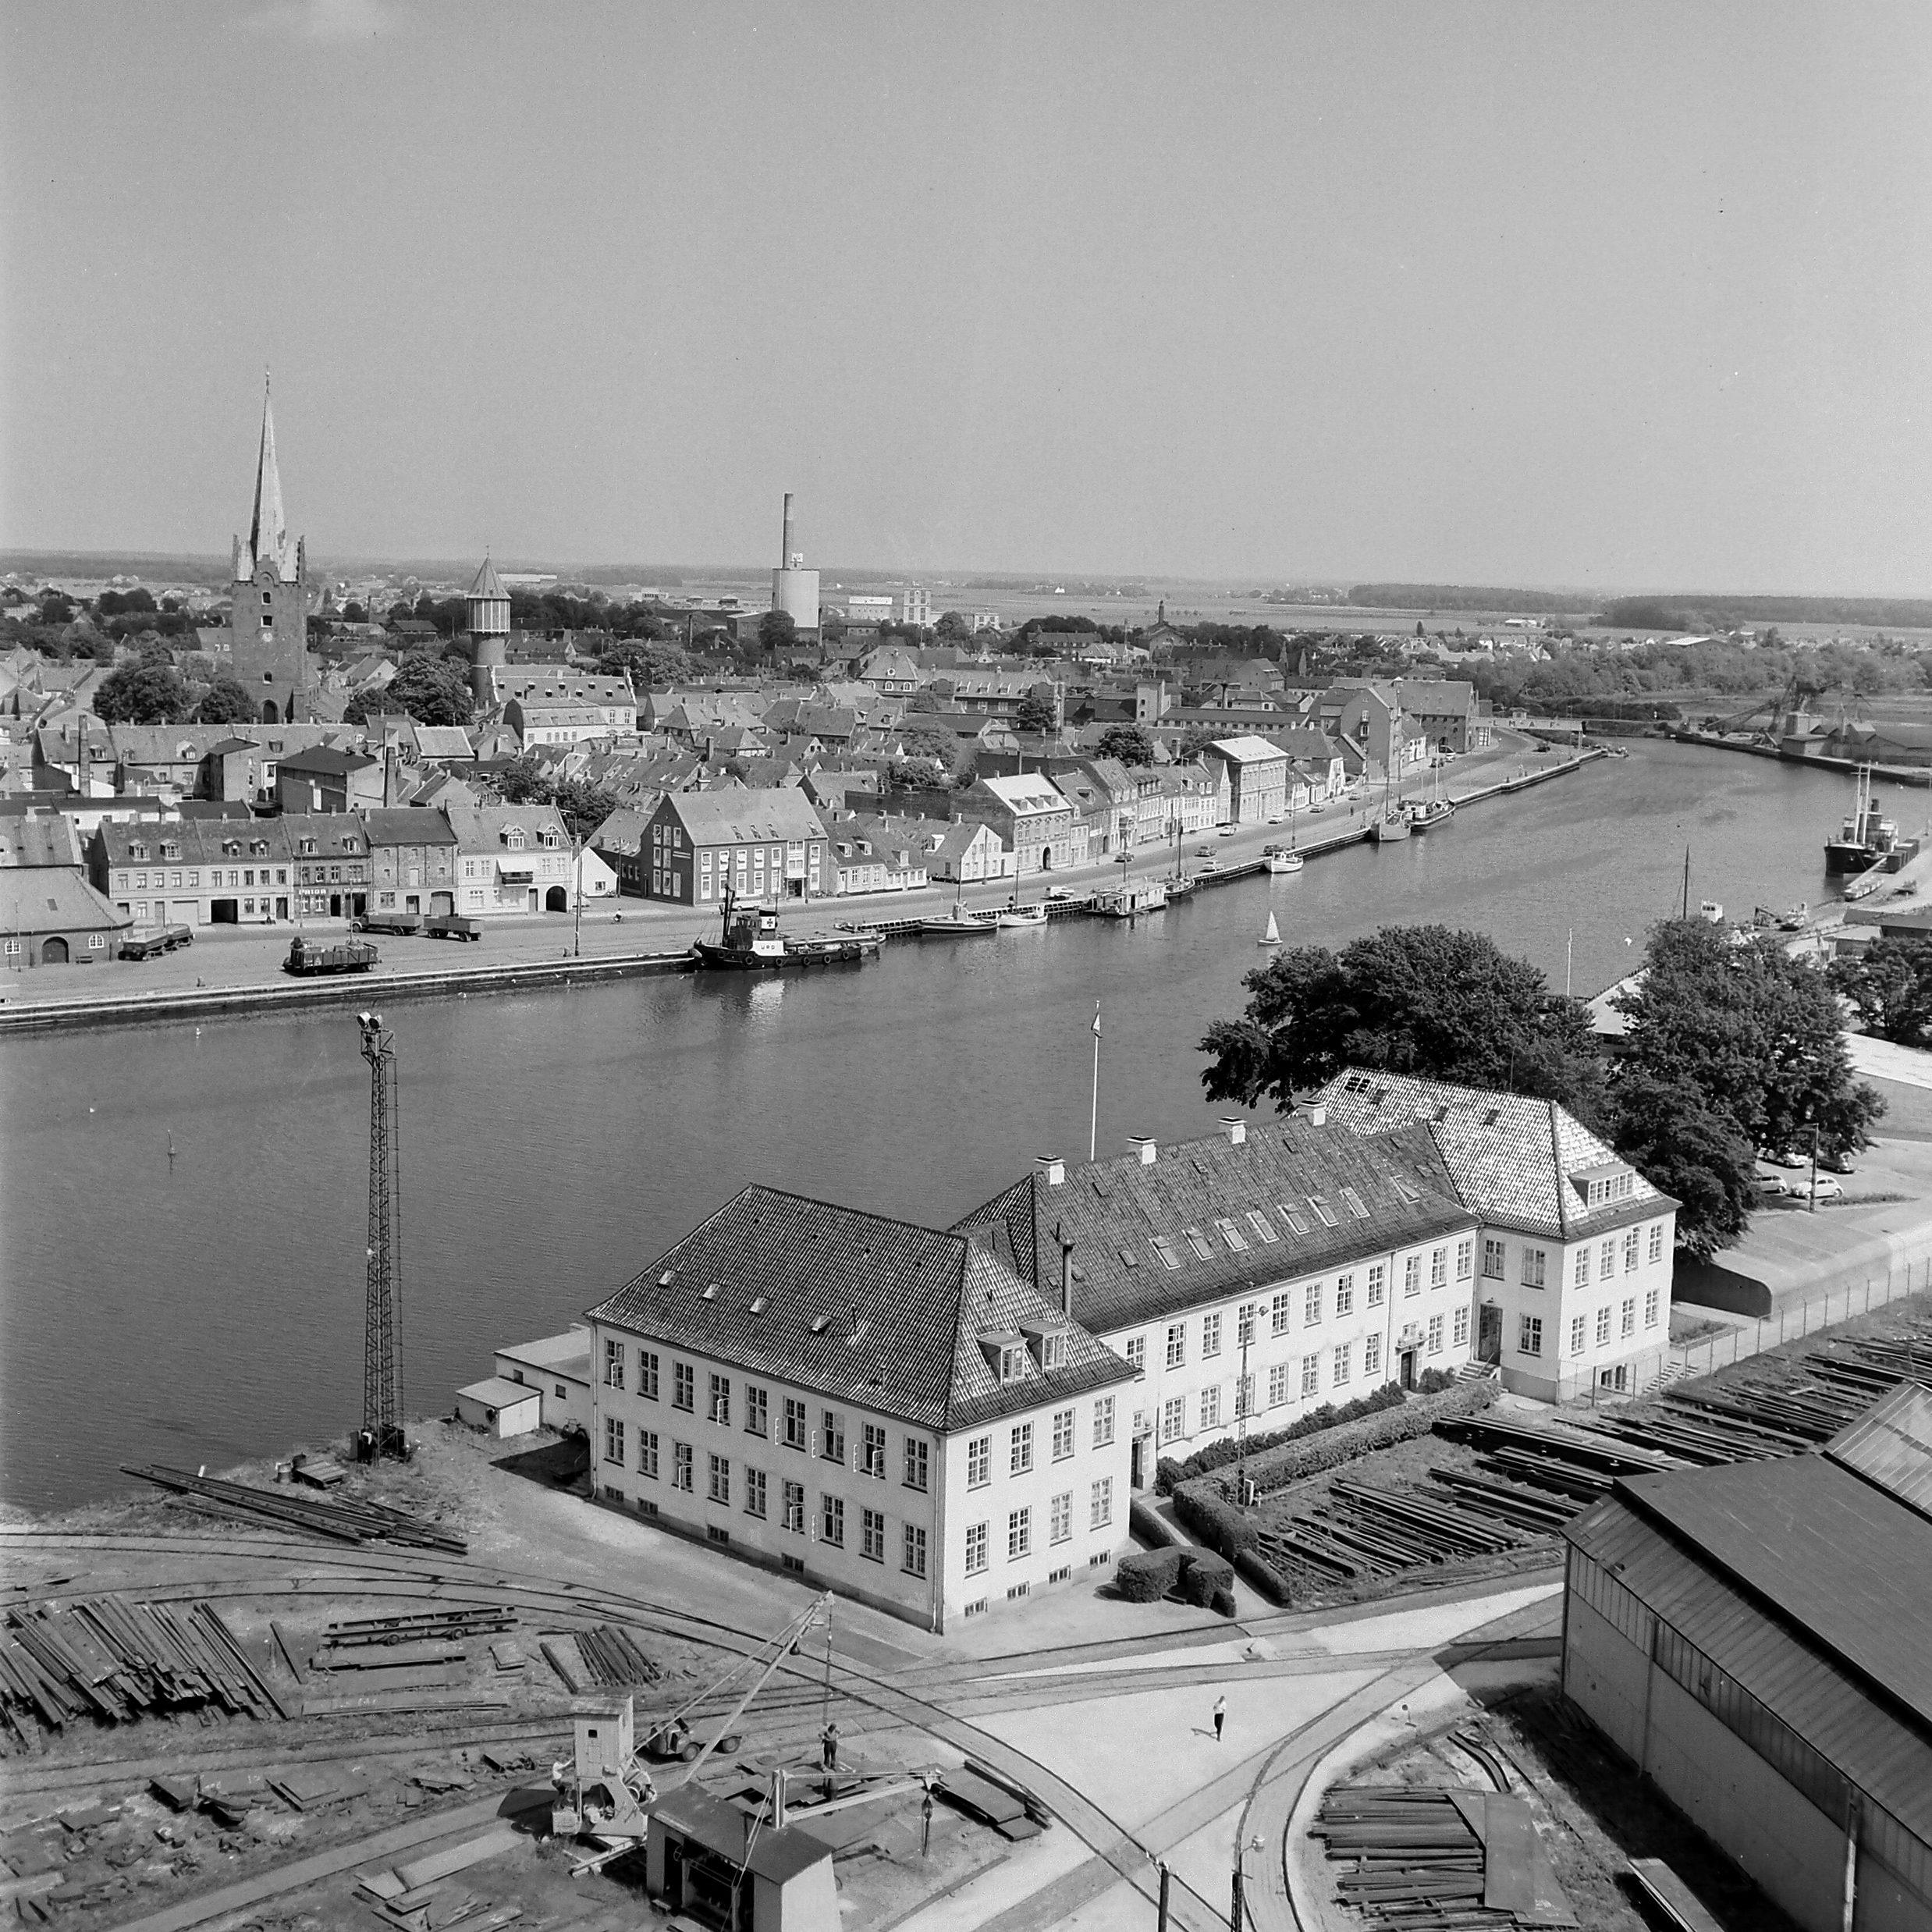 Nakskov Skibsværfts administrationsbyning